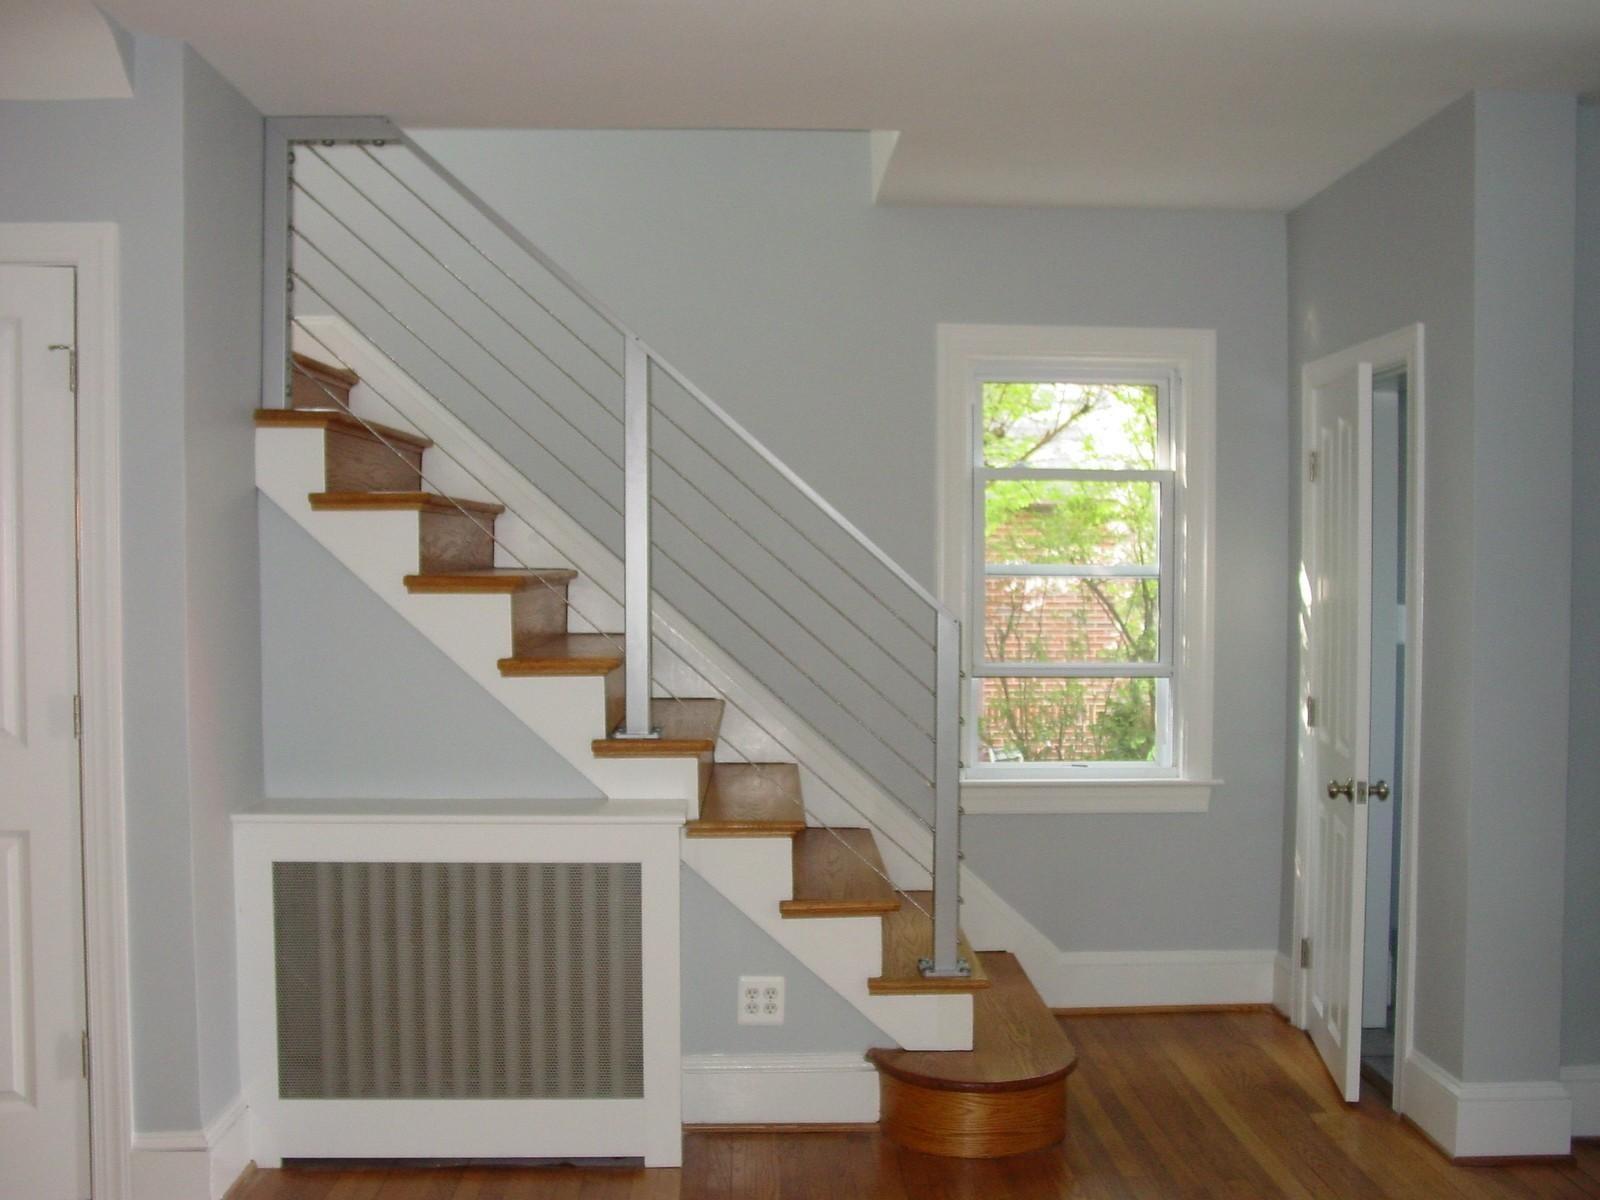 Modern Glass Stair Railing Design Interior Waplag Decoratorist | Stair Railing Designs Interior | Exterior | Creative | Antique | Scandinavian | Rod Iron